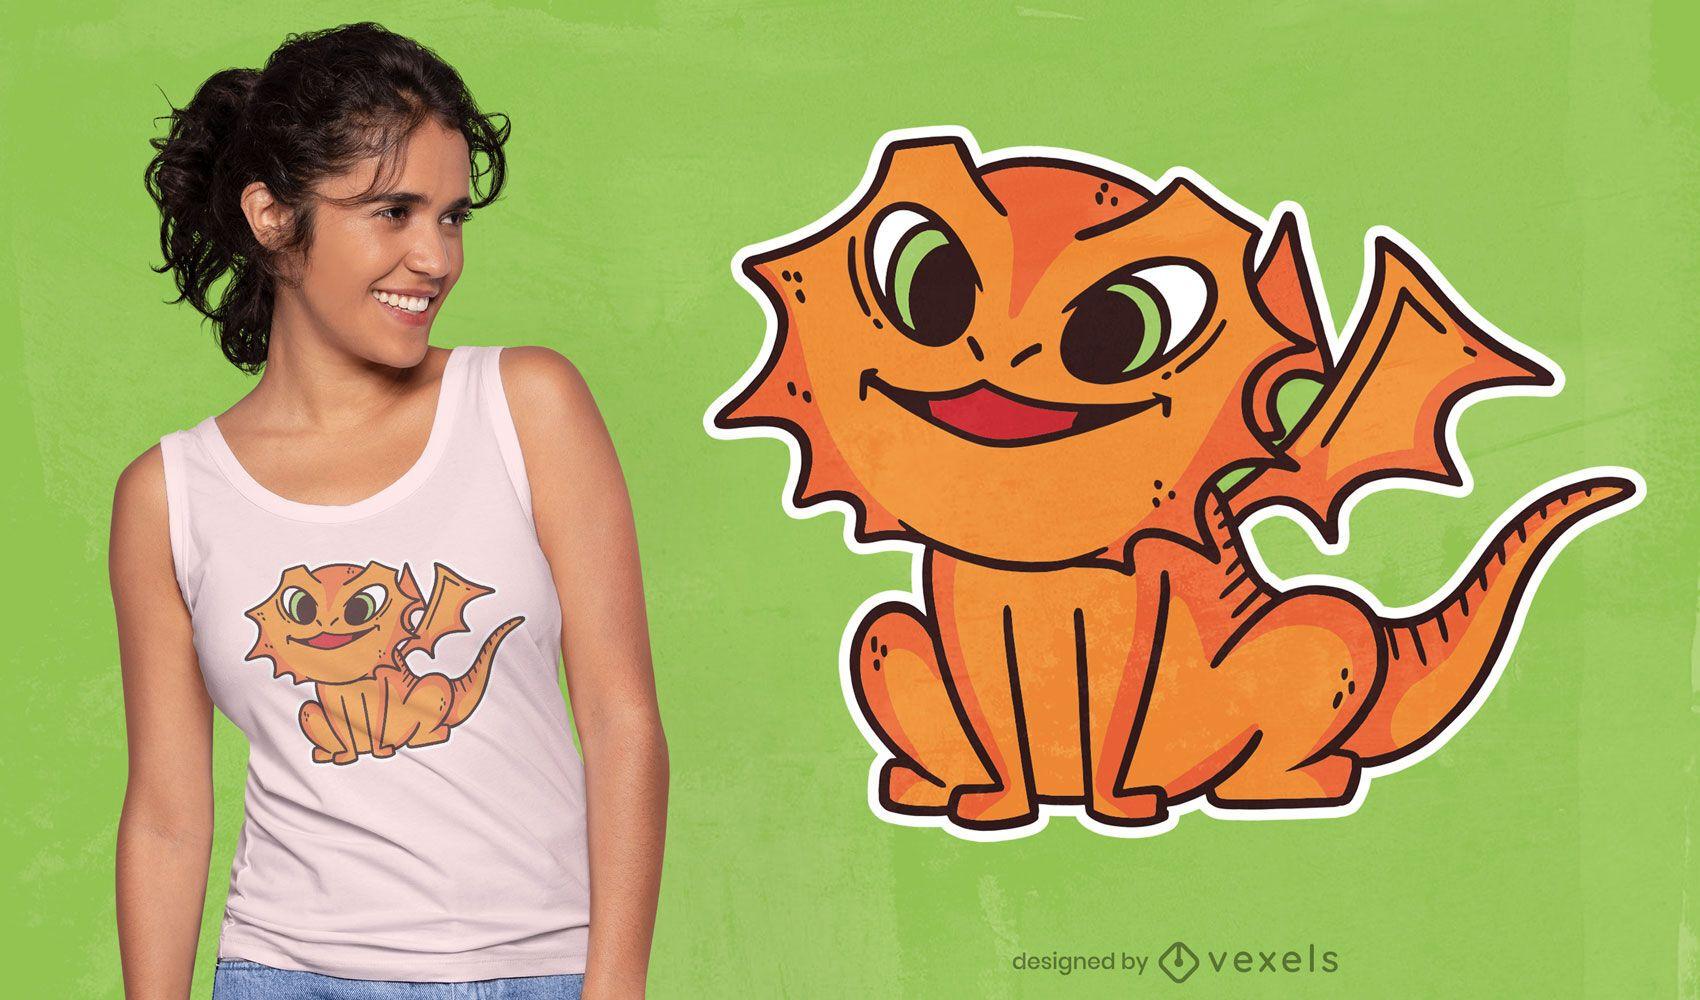 Cute baby dragon t-shirt design